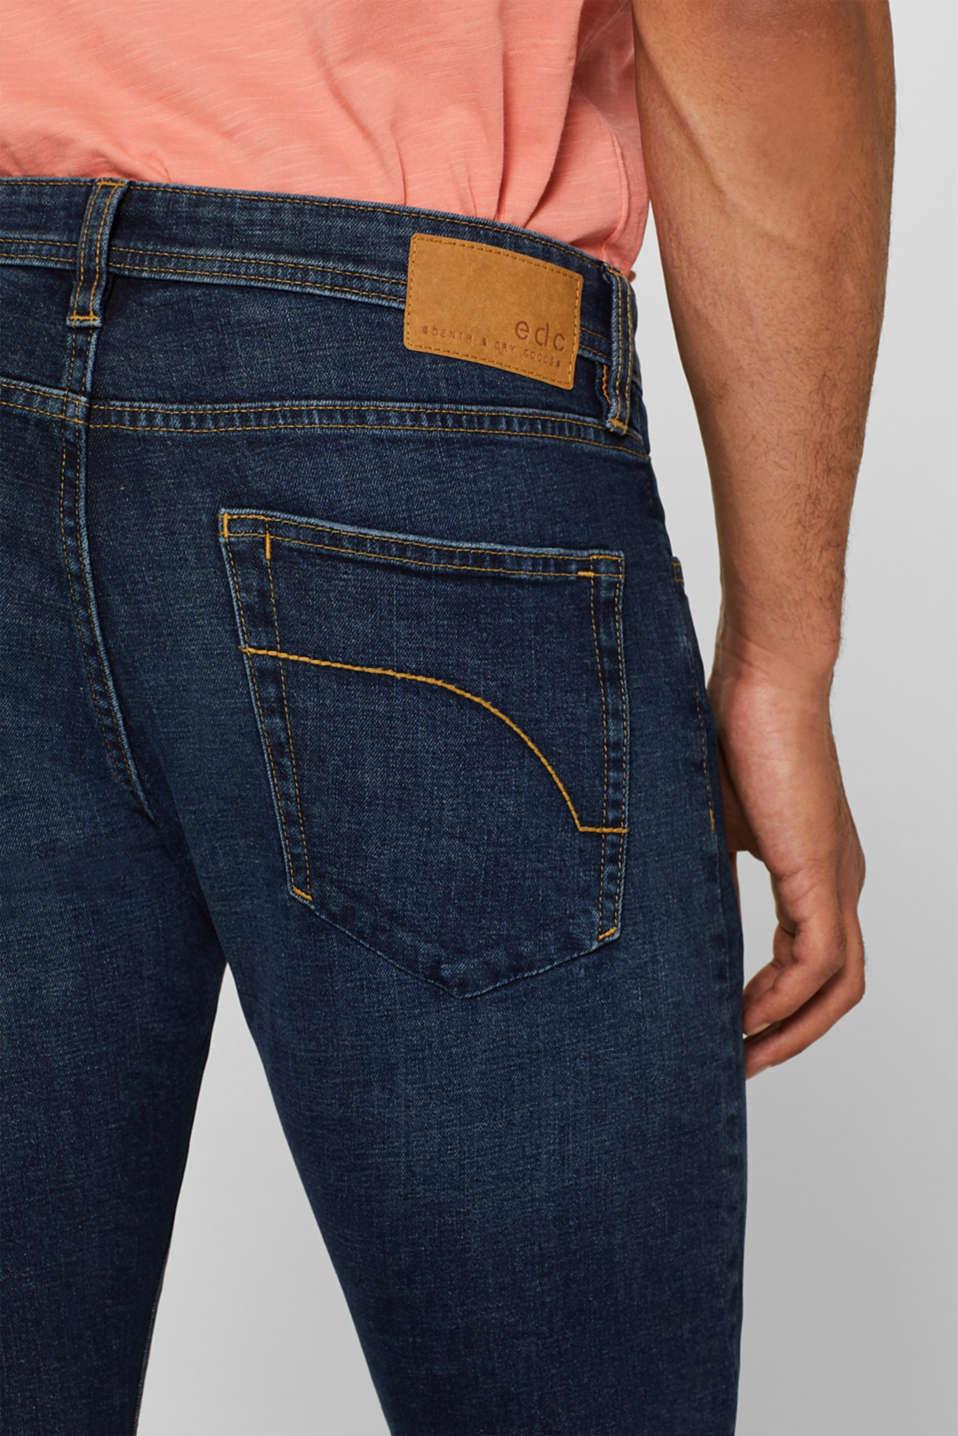 Pants denim Slim fit, BLUE DARK WASH, detail image number 3